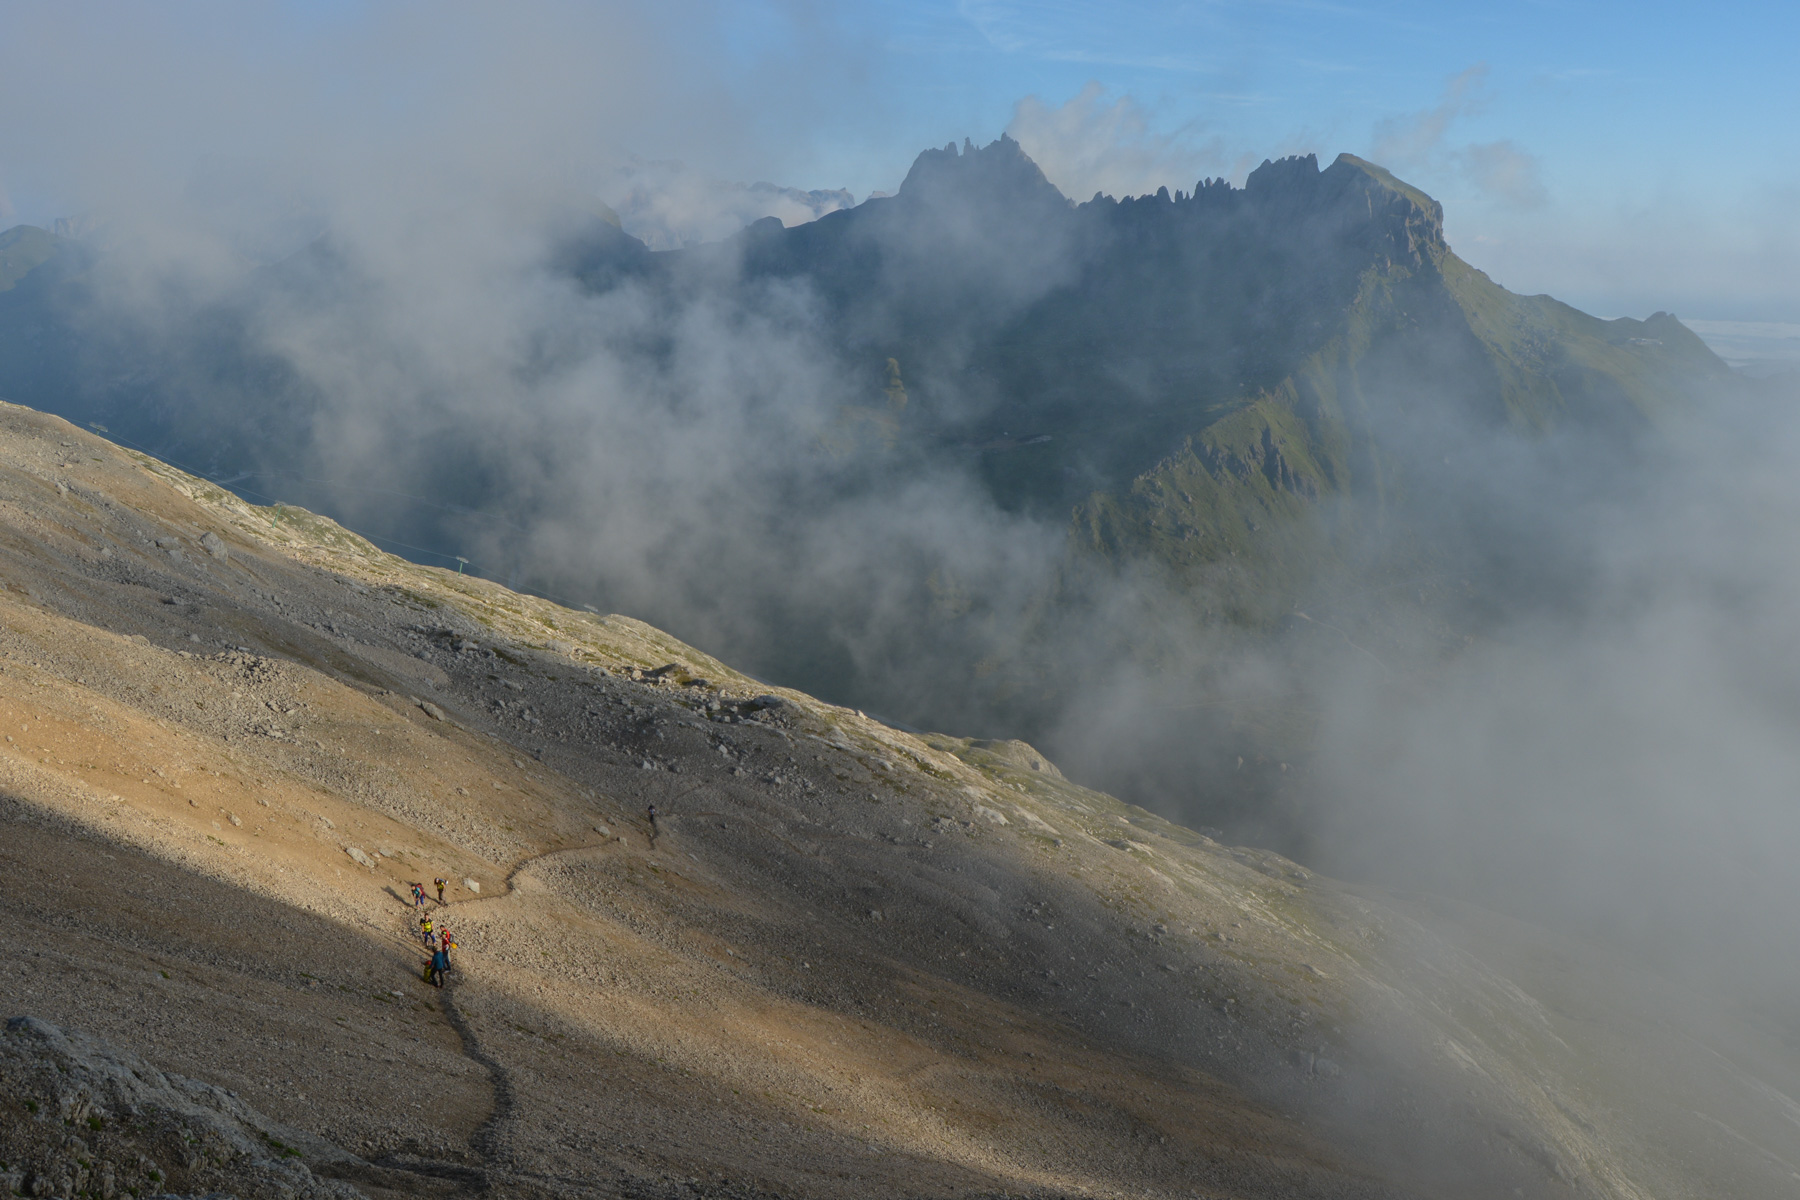 Via Eterna Brigata Cadore, Dolomites 6